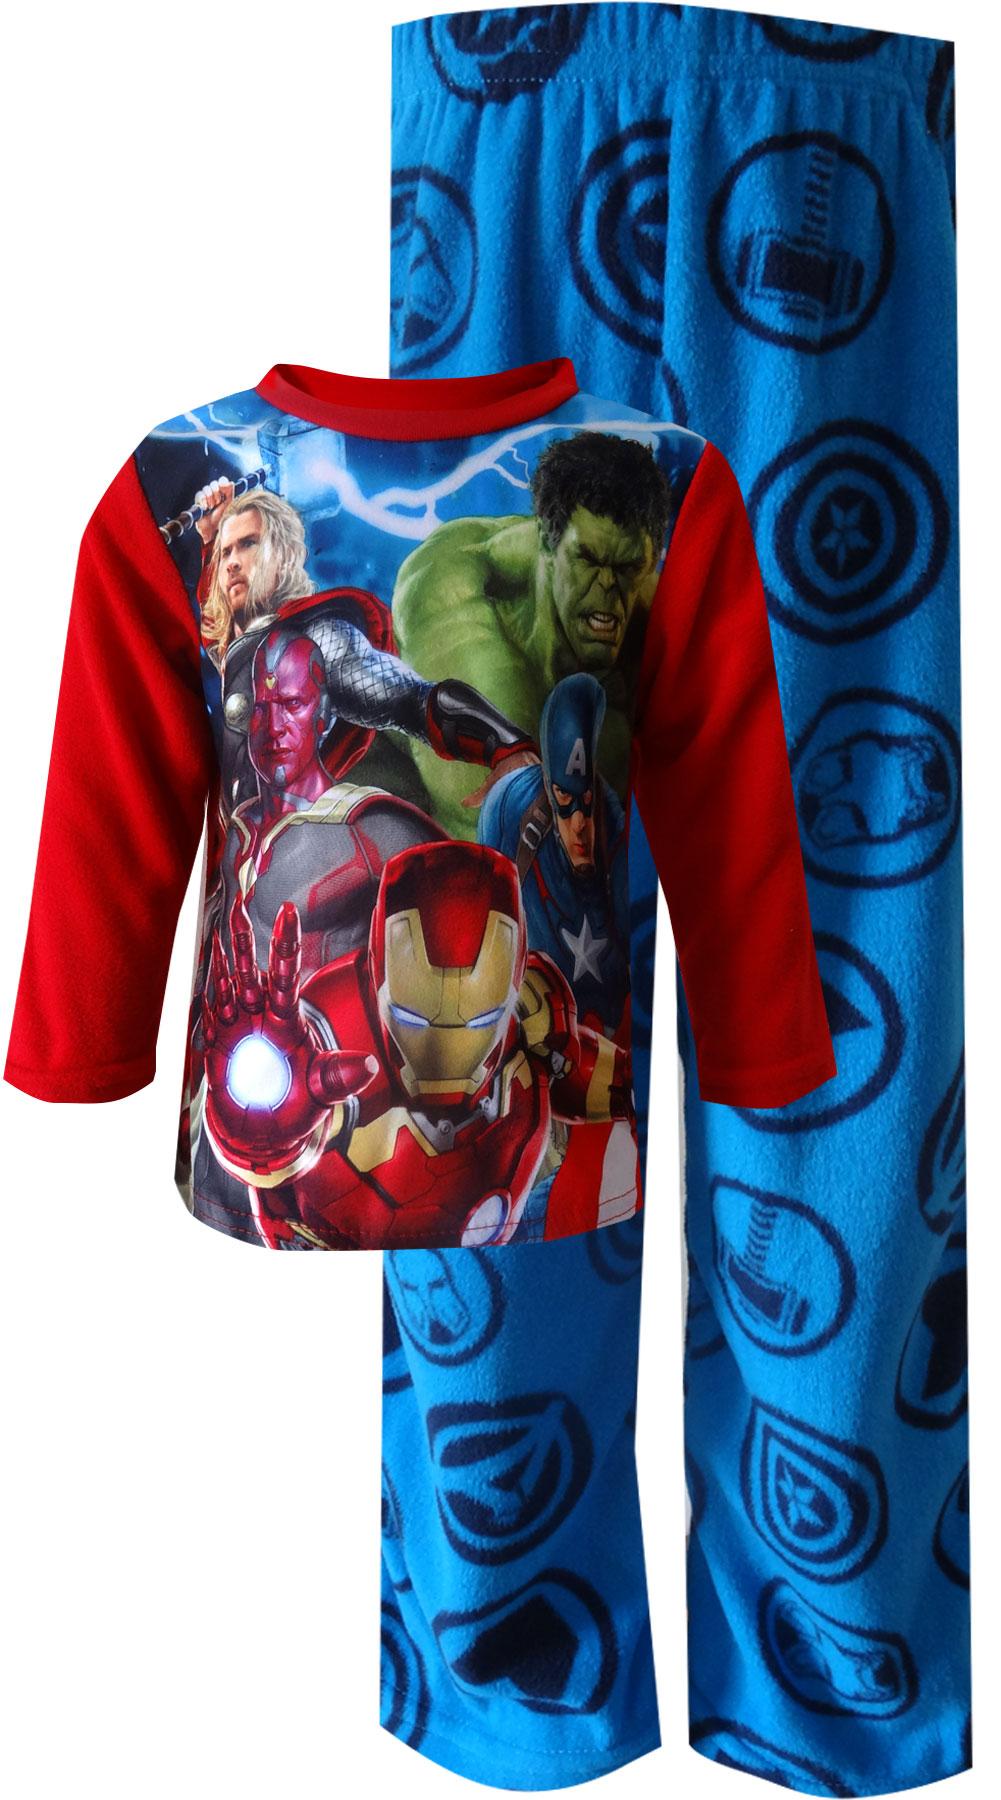 Marvel Comics Avengers Movie Image Fleece Pajamas